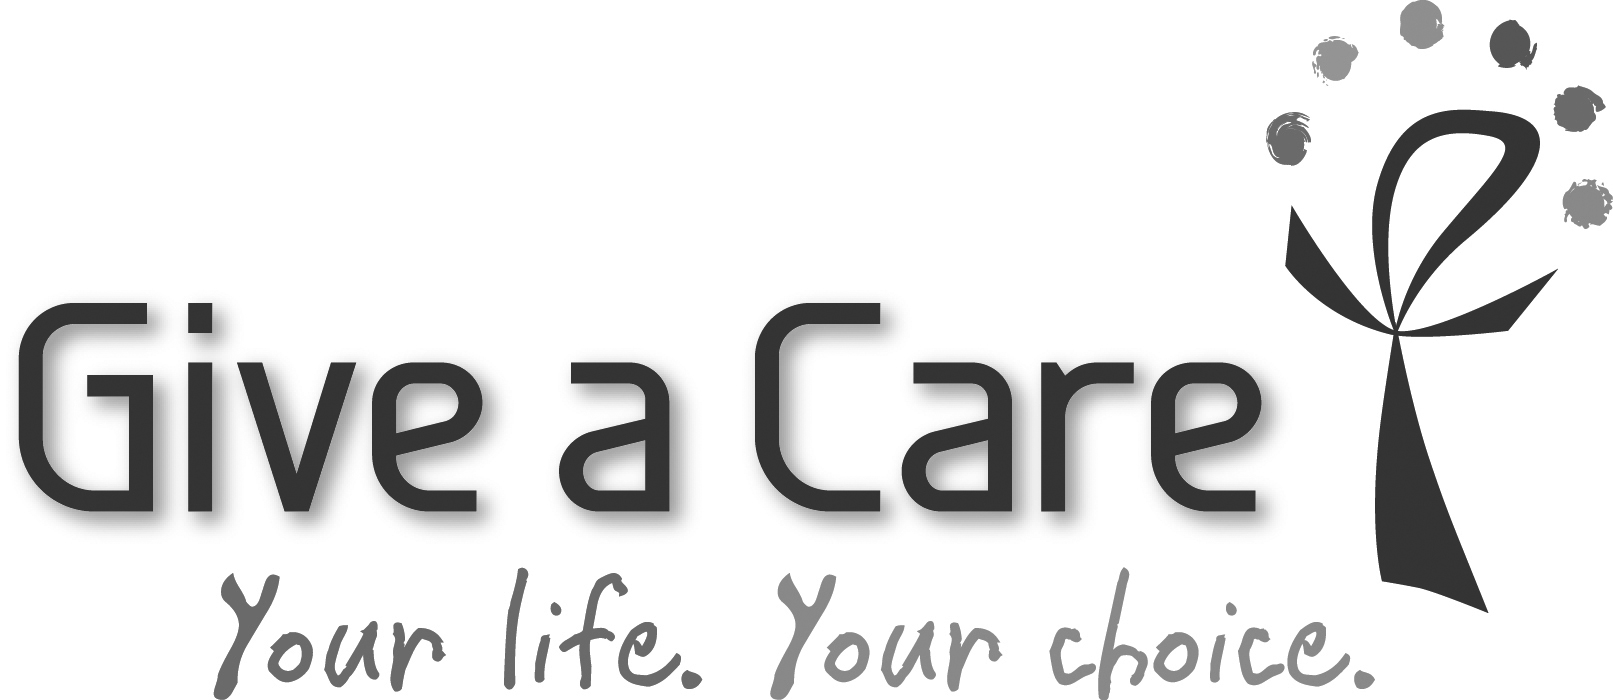 Give-a-Care-logo_outlines_CMYK_600dpi